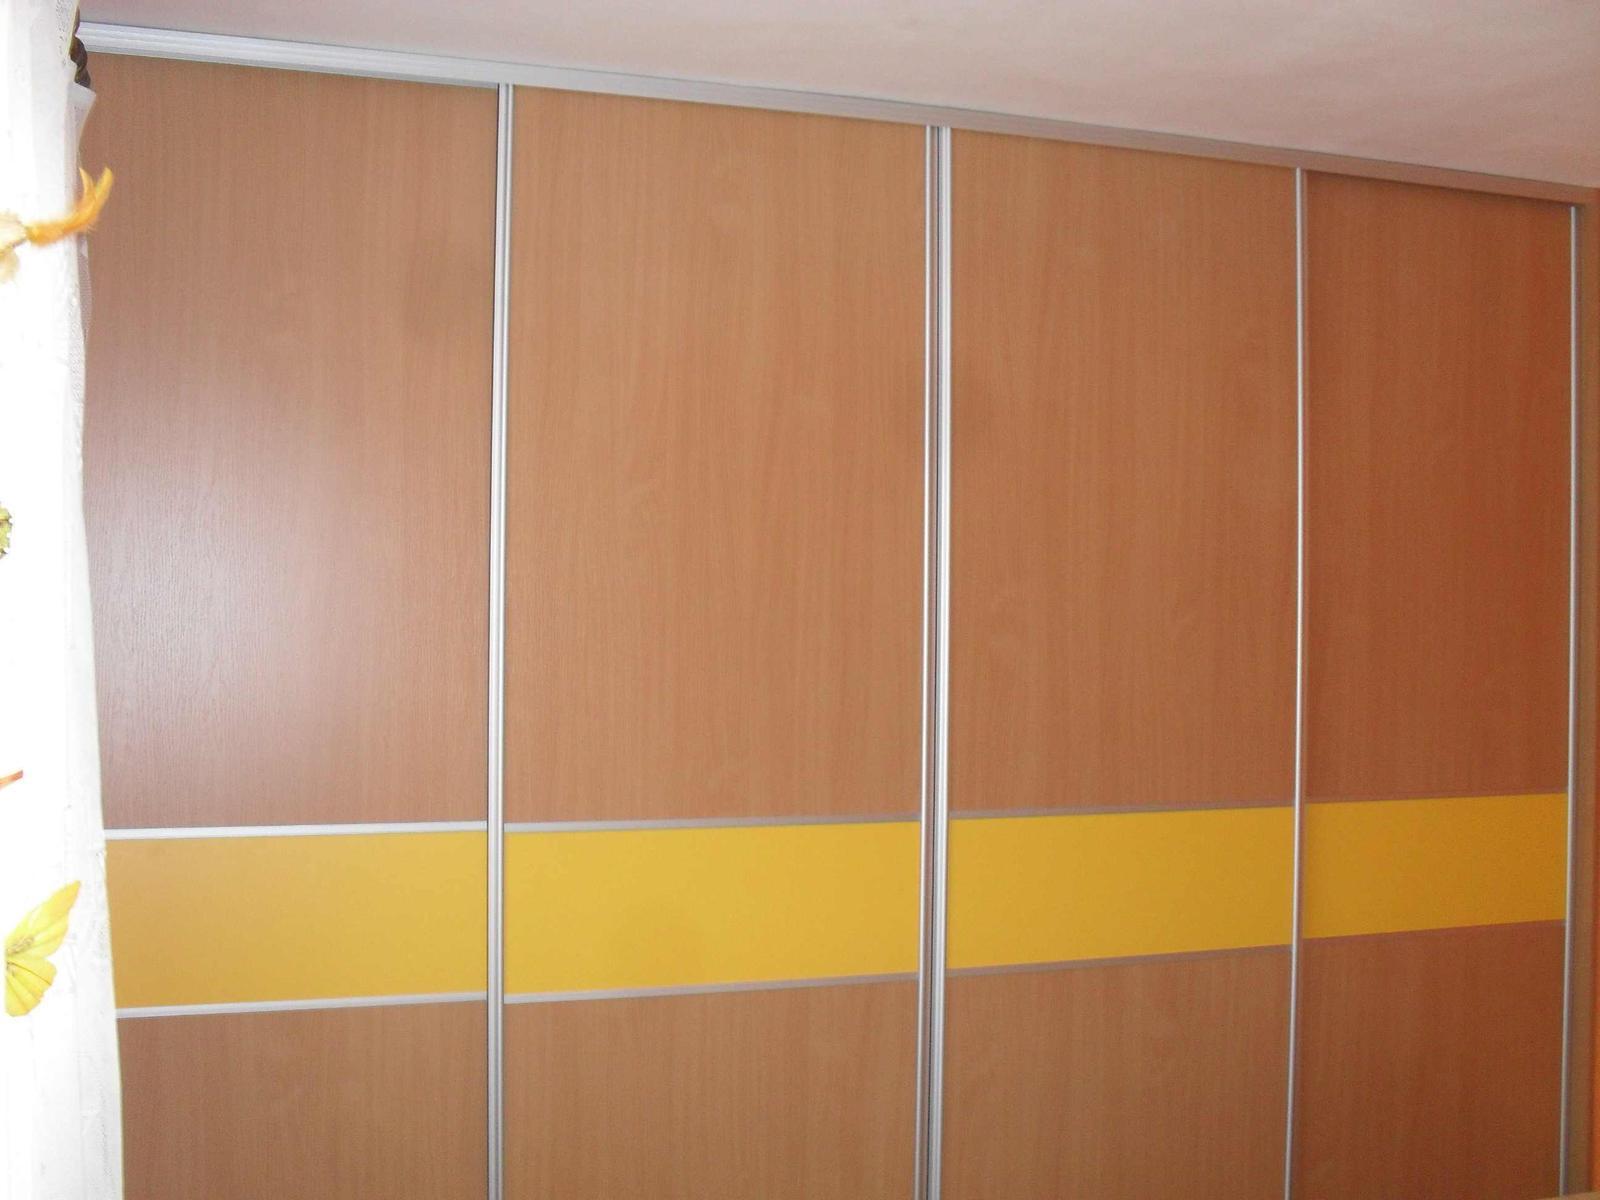 Vstavané skrine Martin Benko Bošany - Obrázok č. 26